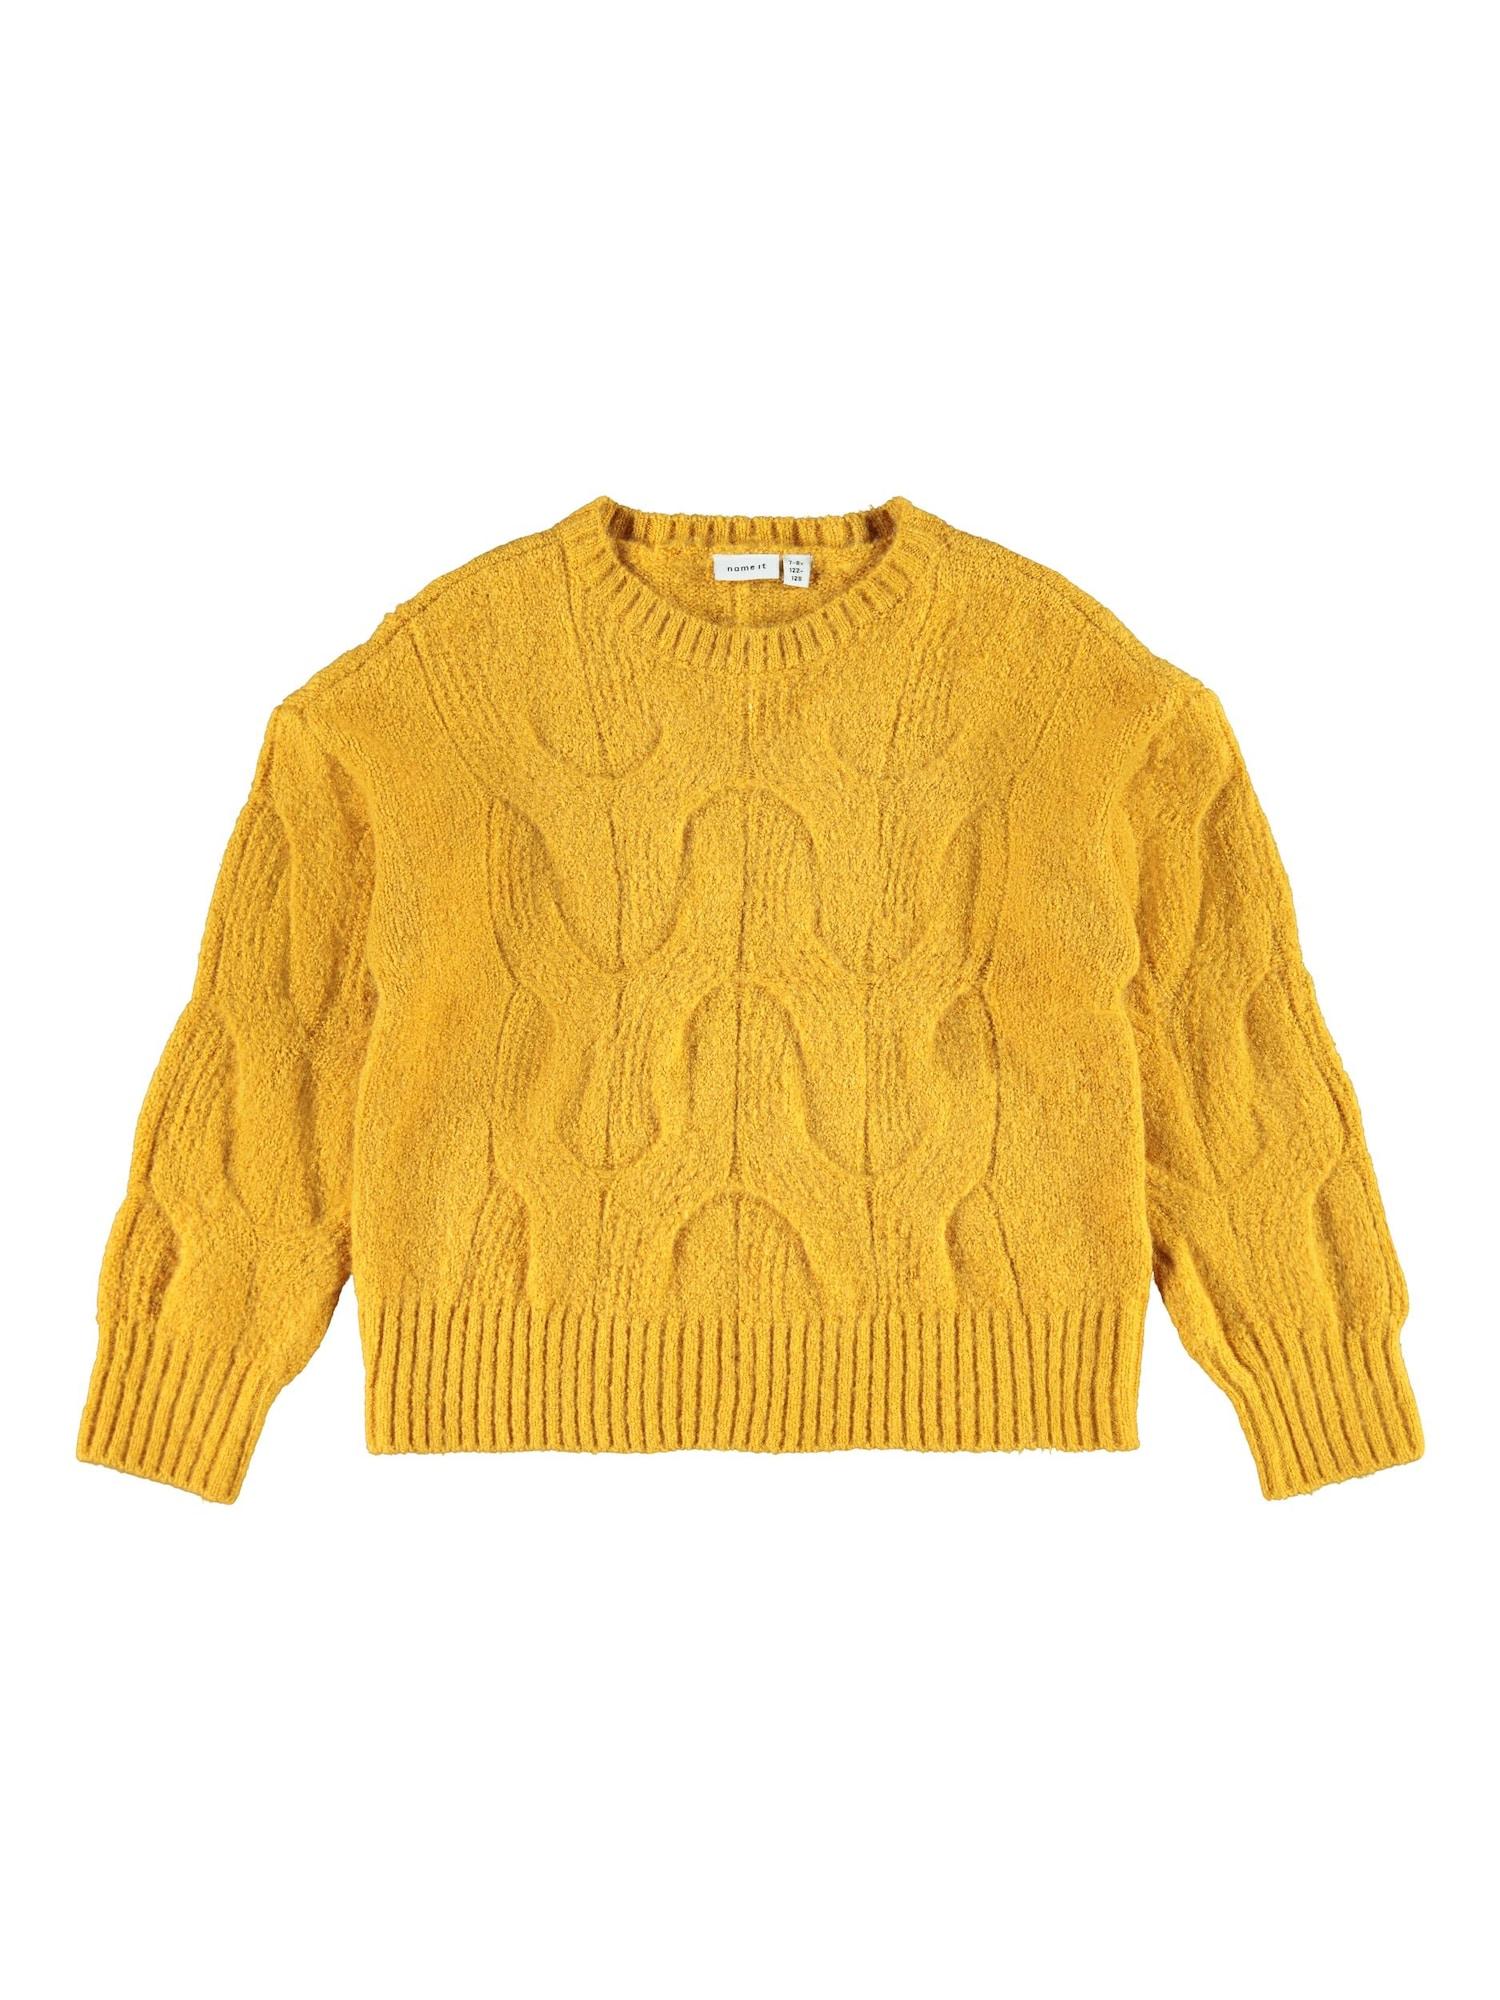 NAME IT Megztinis aukso geltonumo spalva